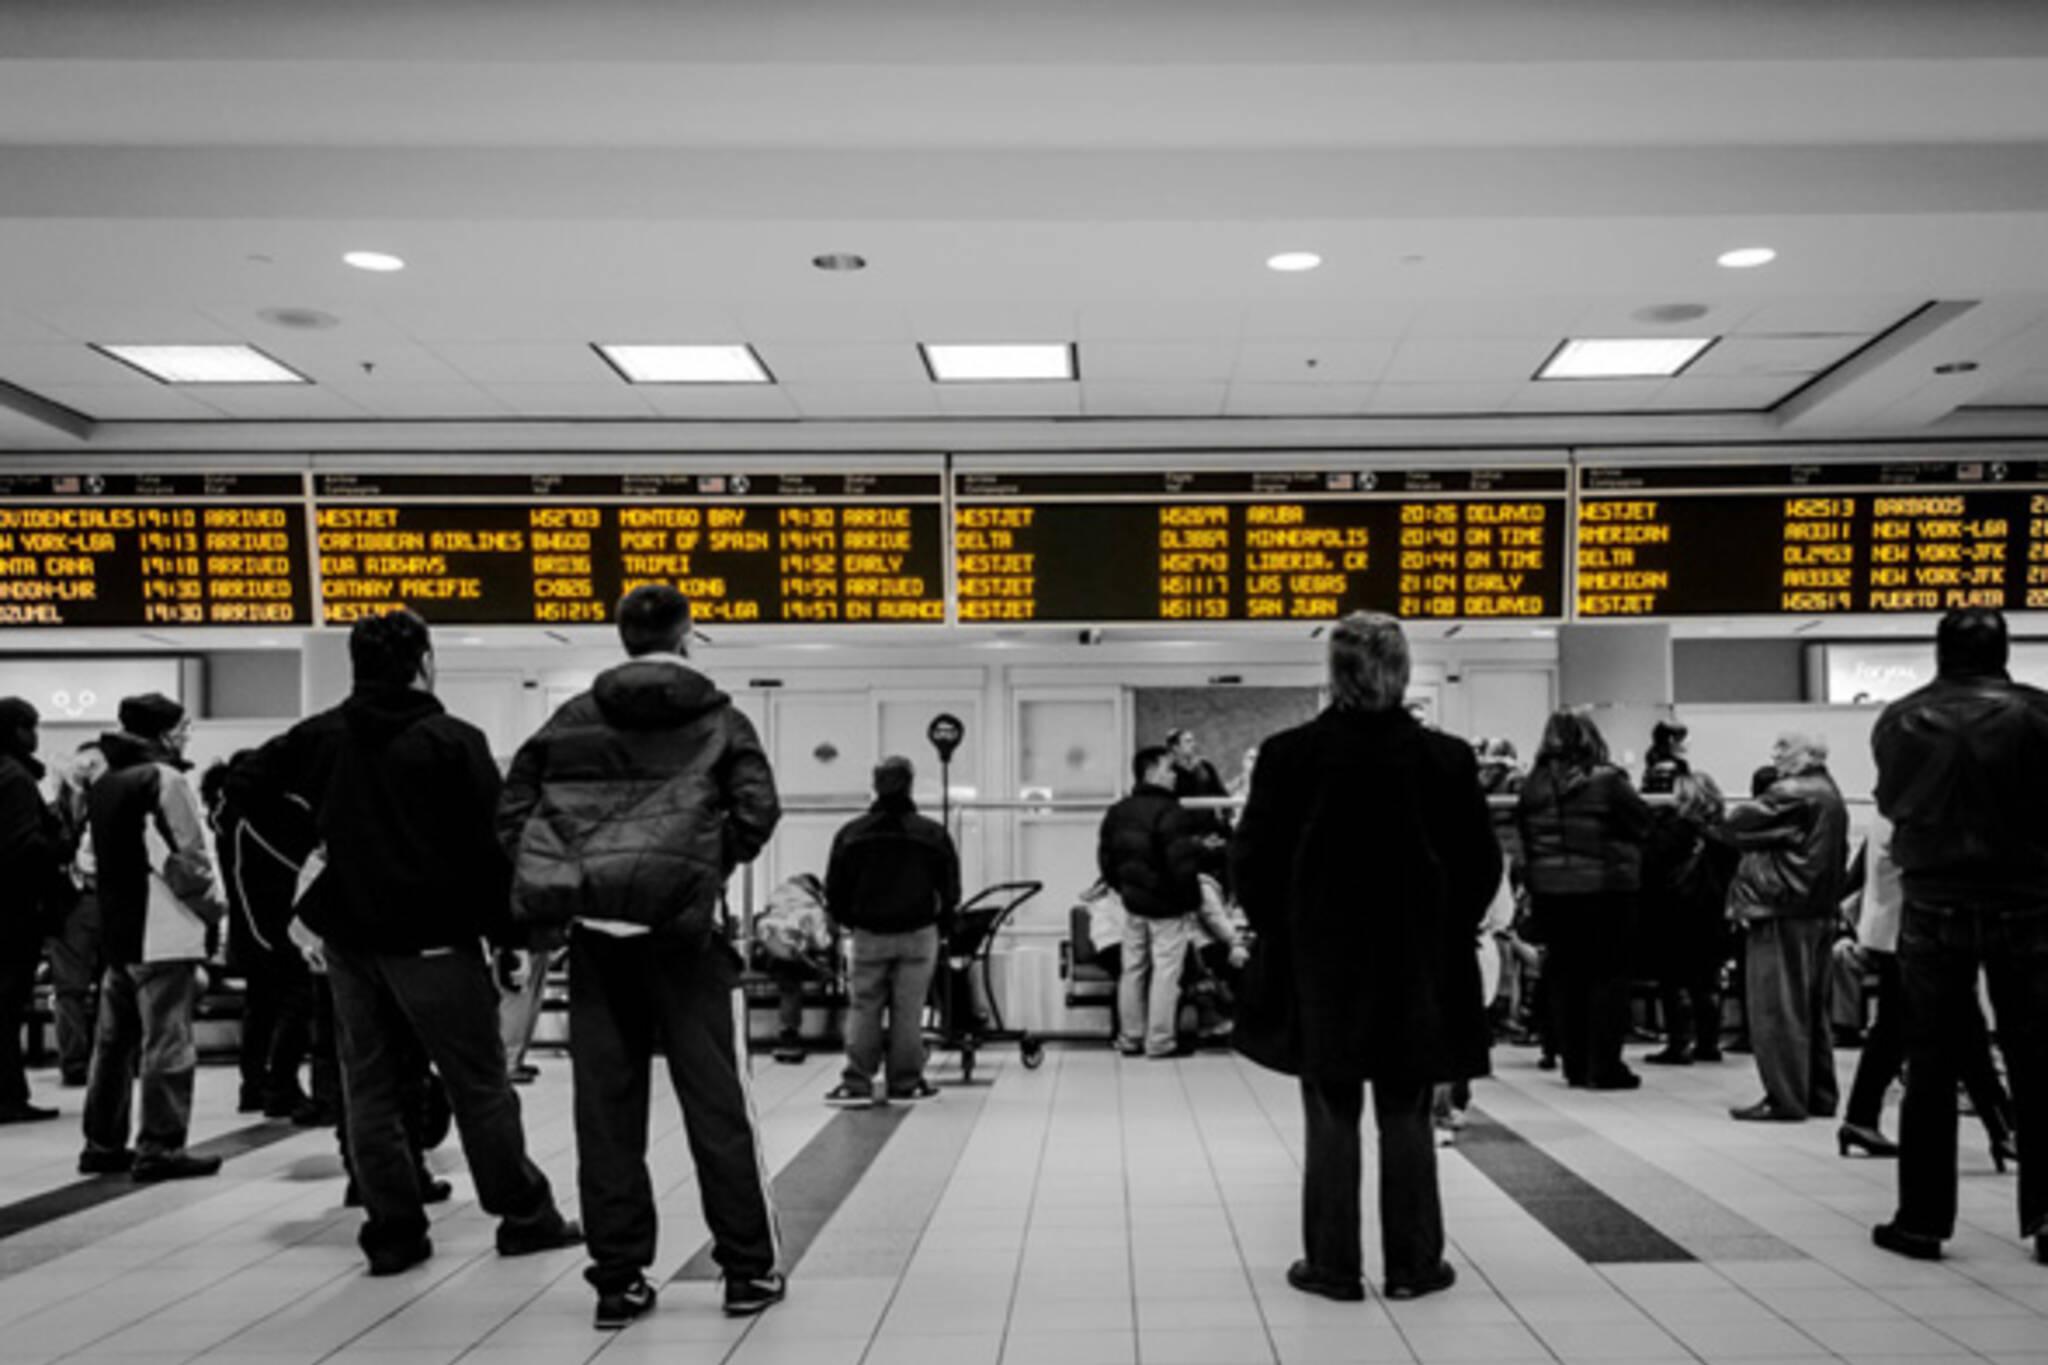 Toronto airport delays